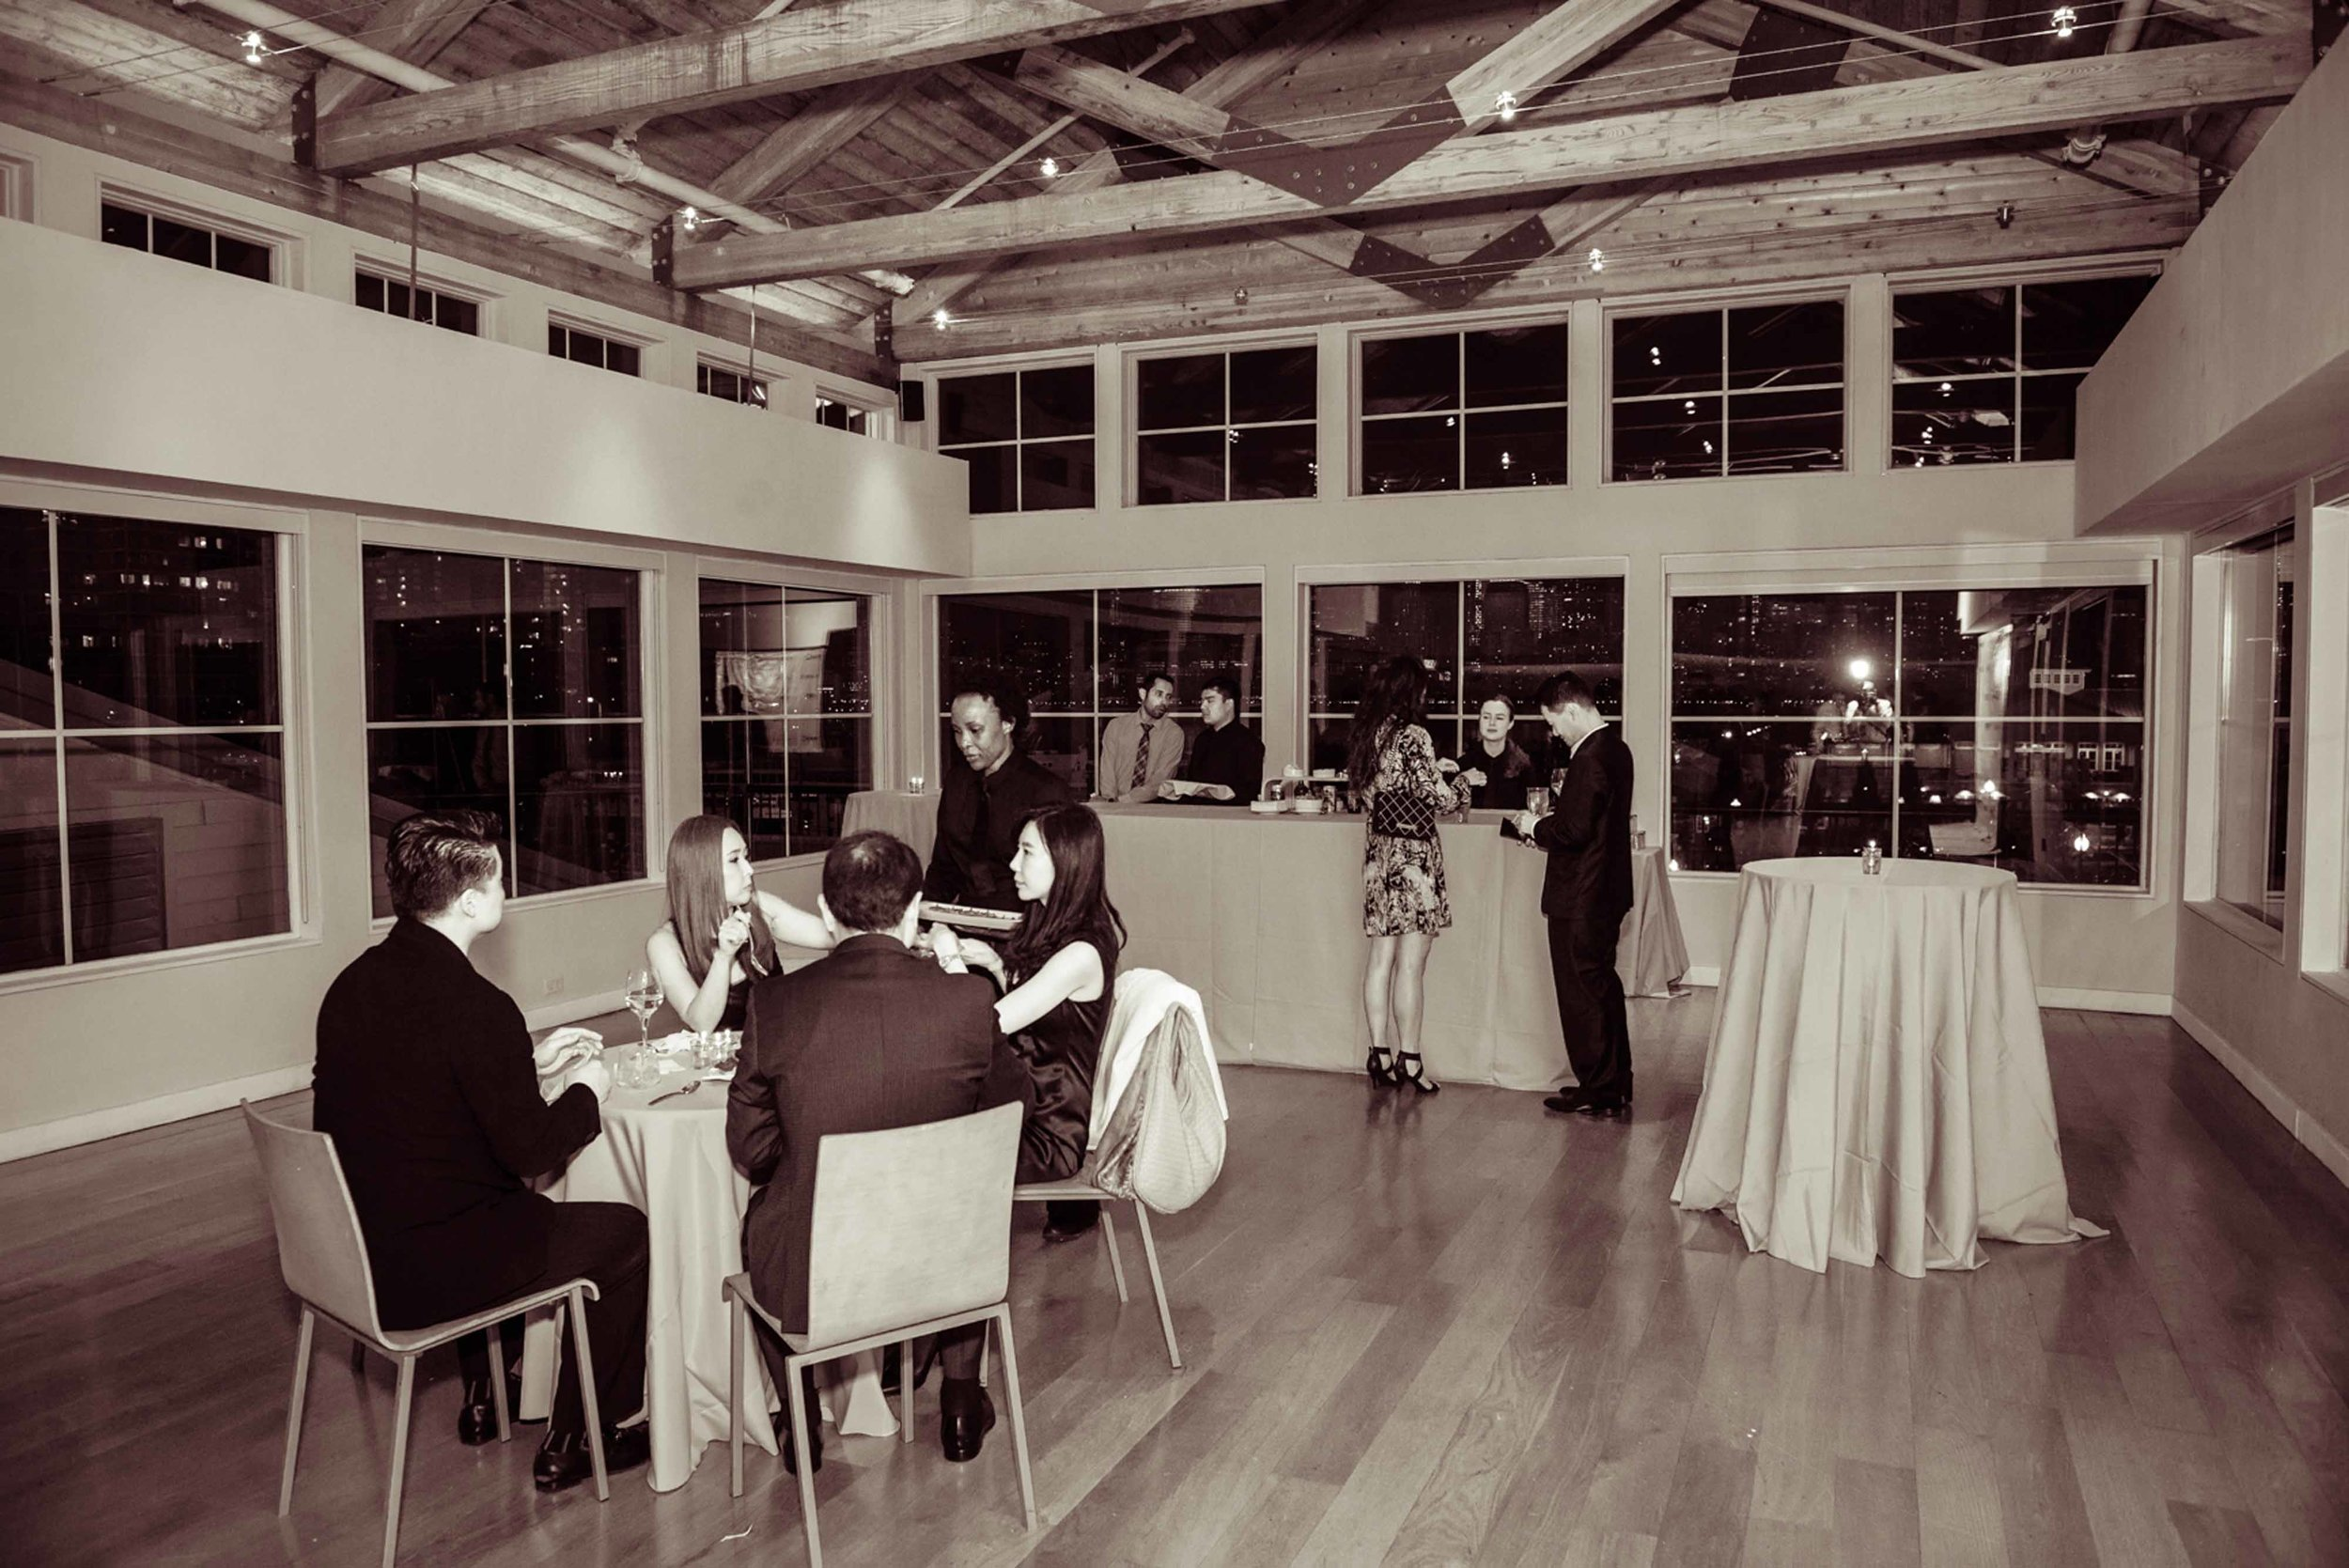 2017-10-21 Zimele USA 6th Annual Gala - Maritime Parc - Jersey City NJ_0033.jpg